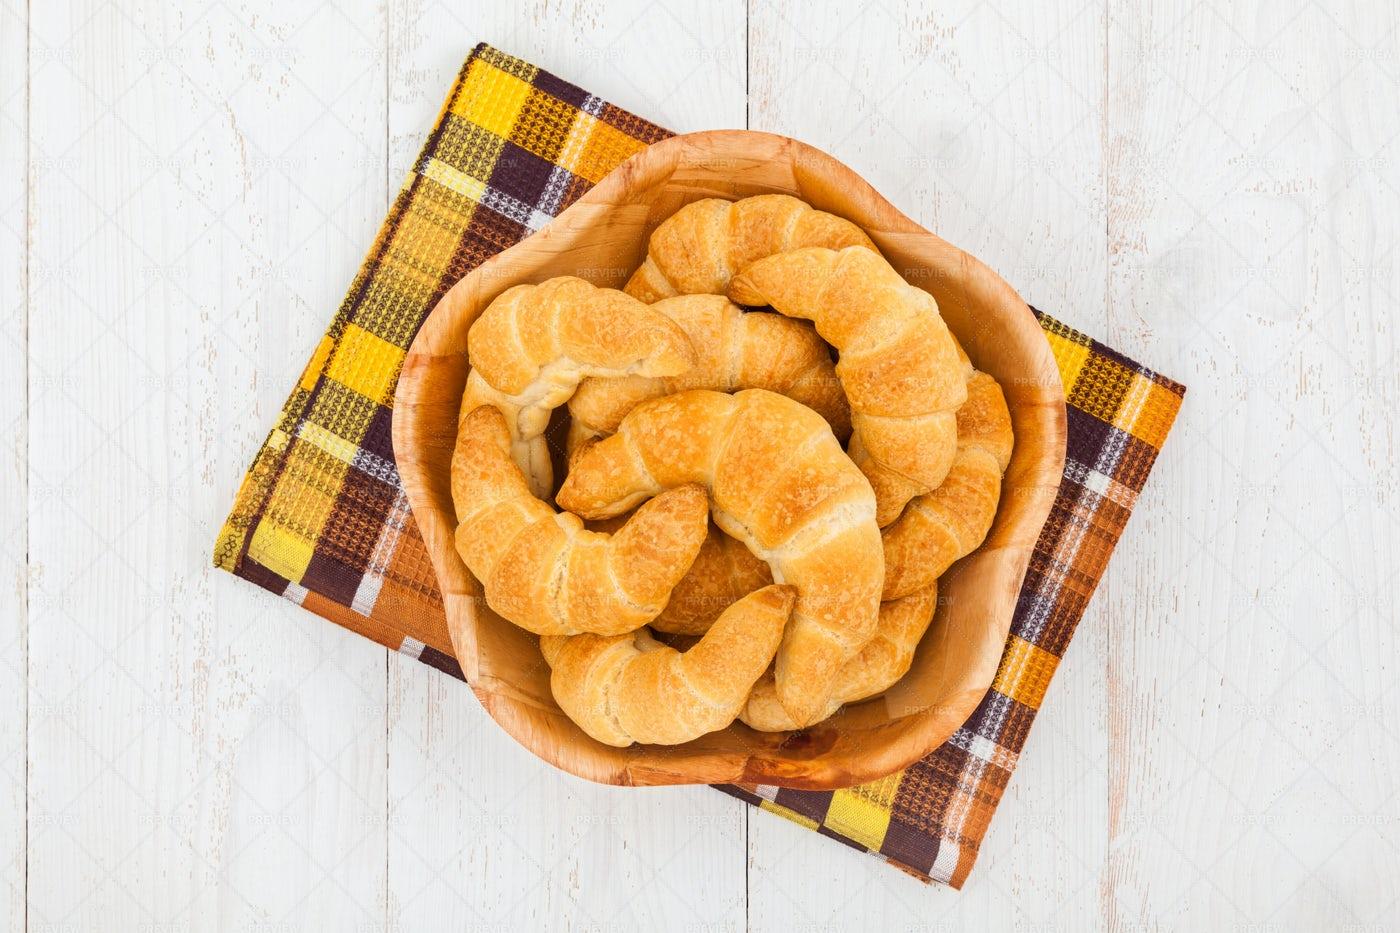 Bowl Of Croissants: Stock Photos